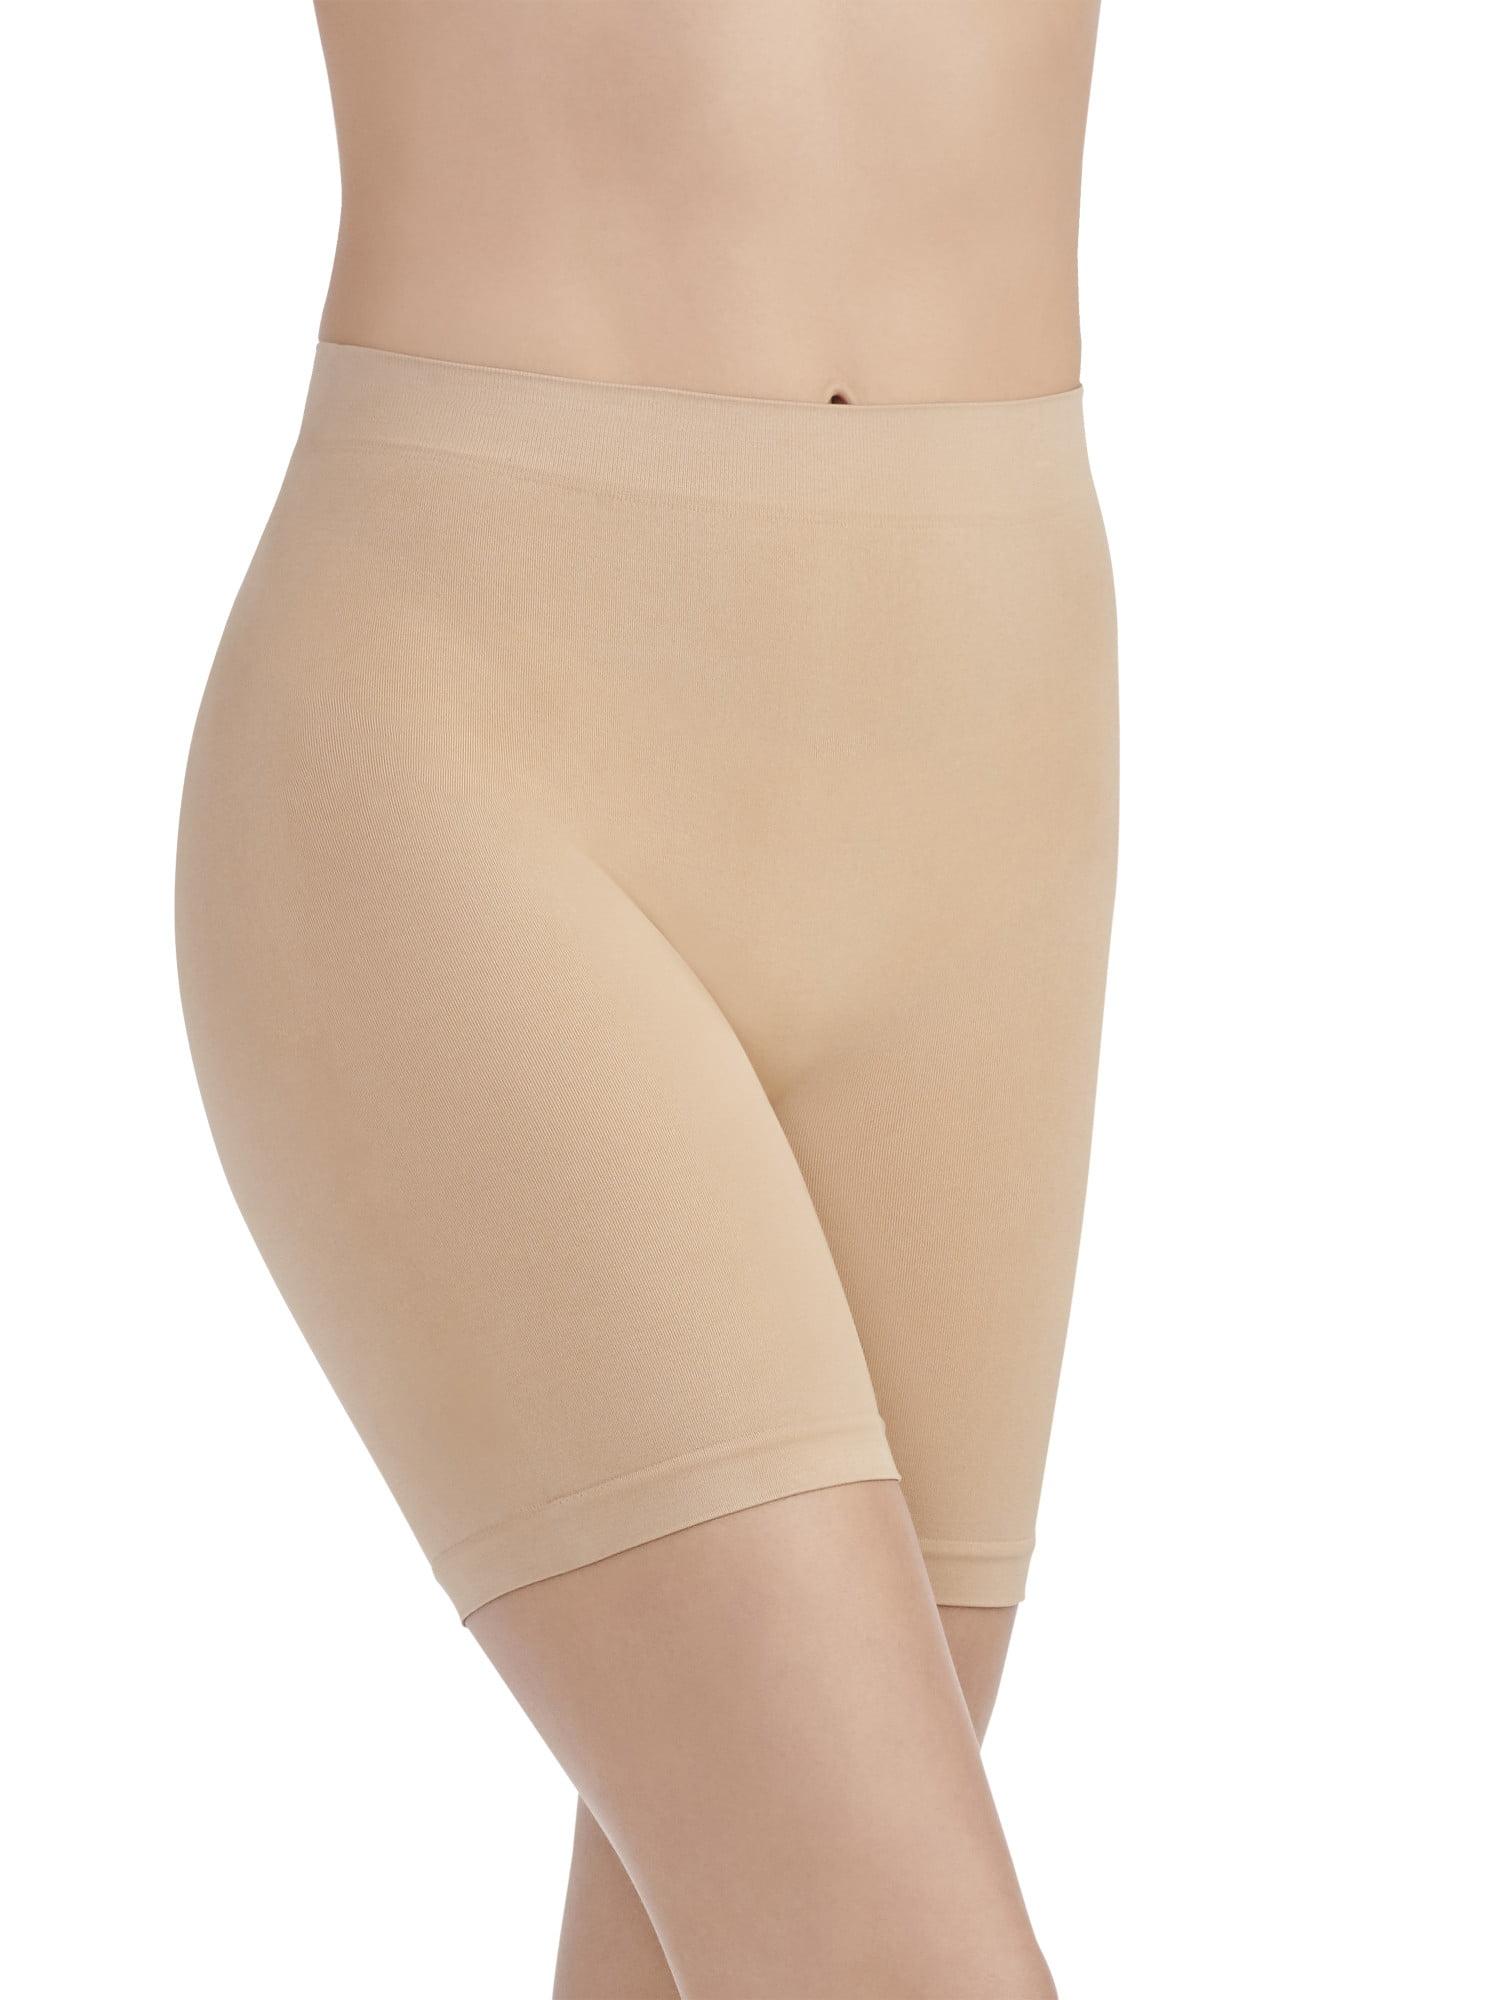 Women's Smoothing Slip Short, Style 12674